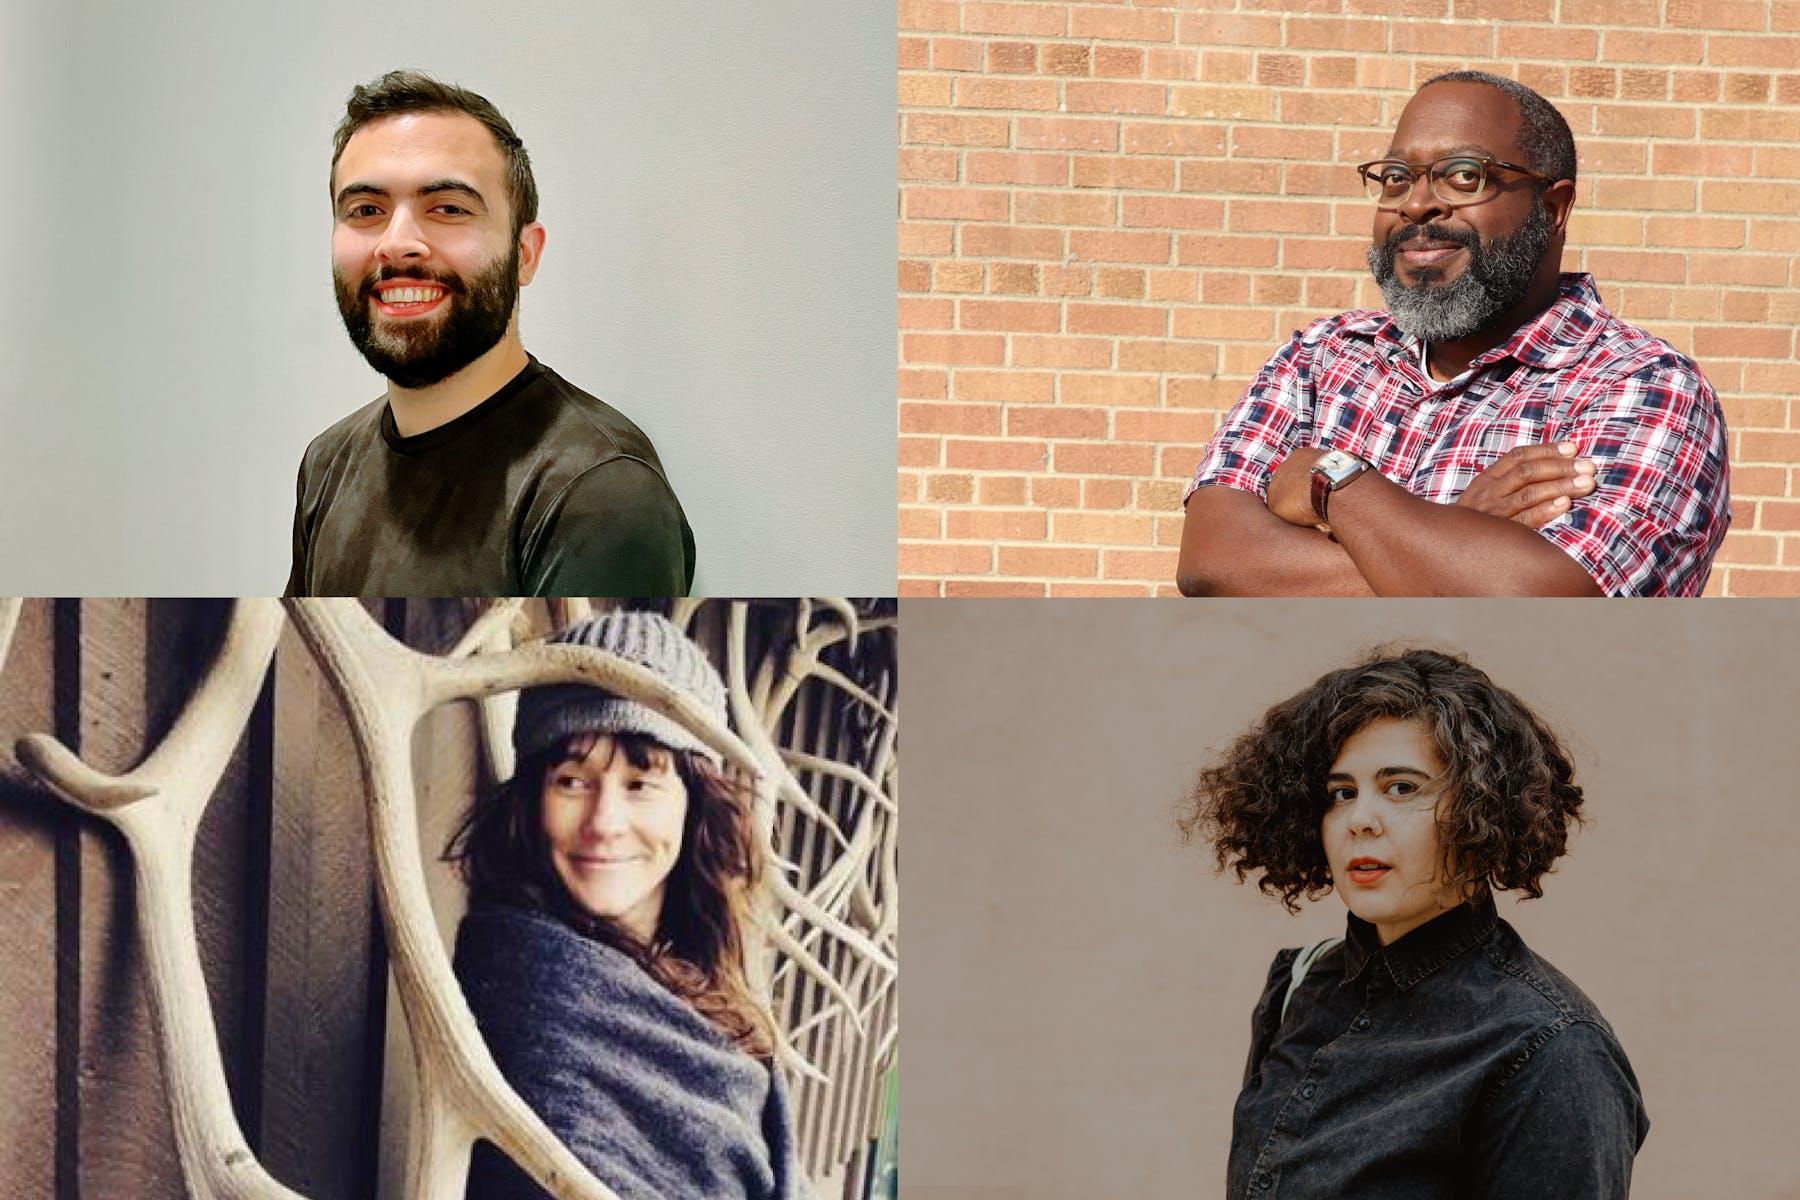 Four portraits of poets